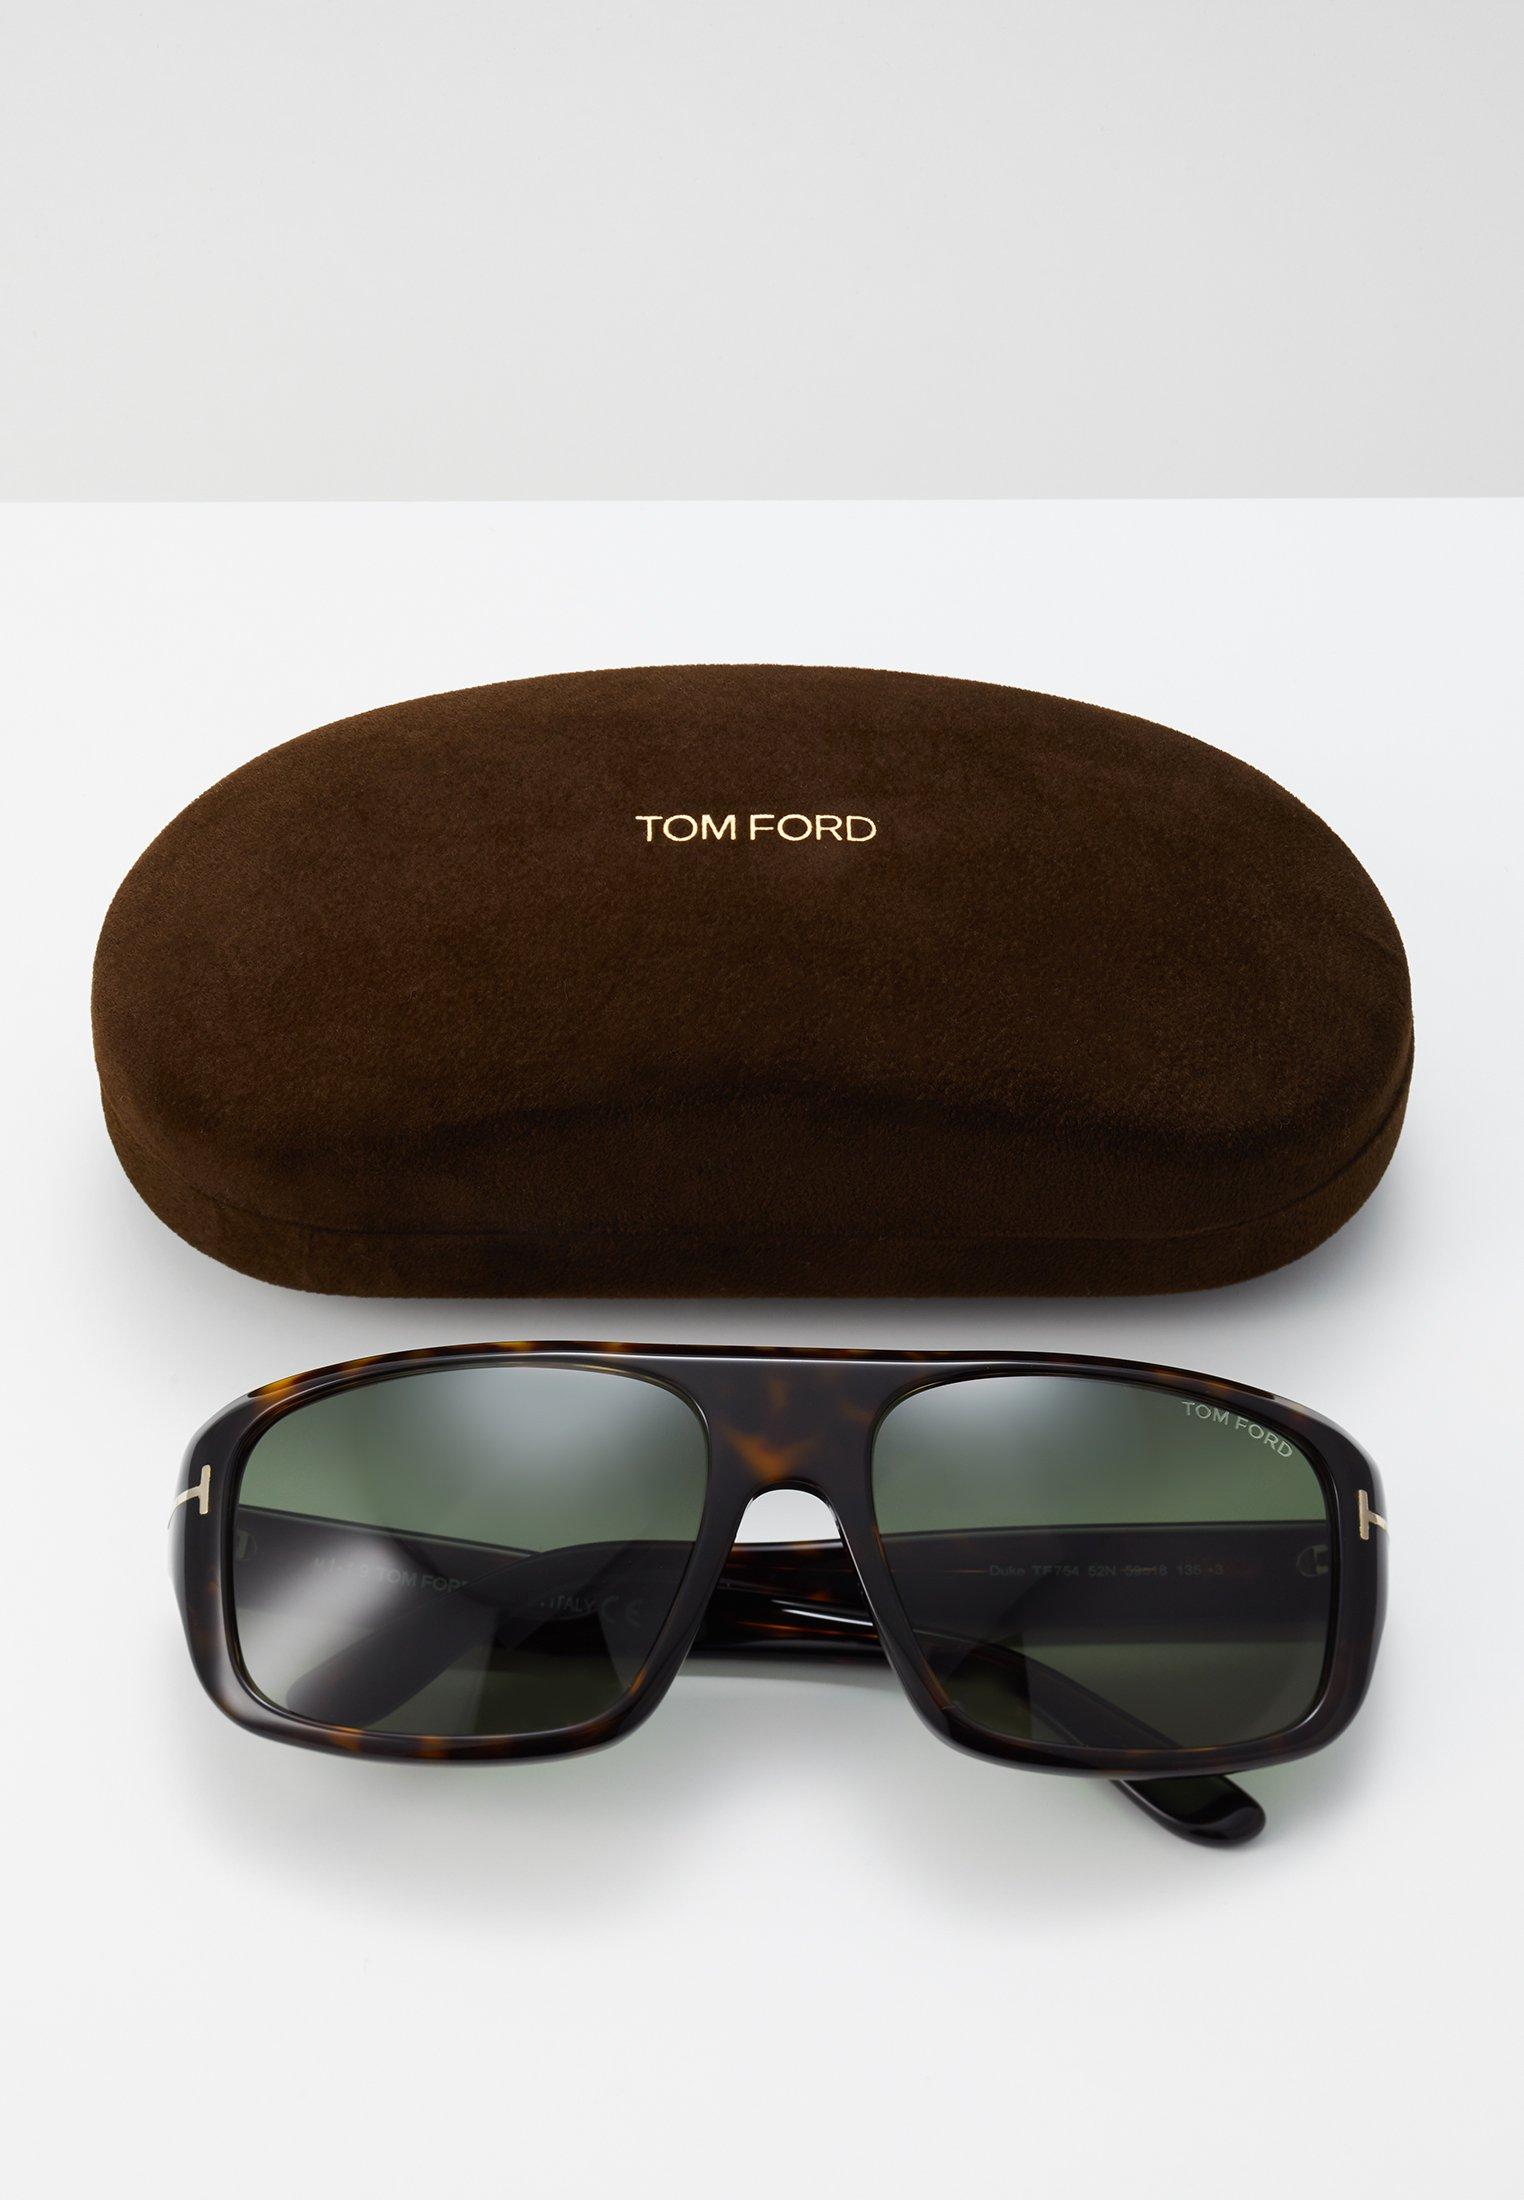 Tom Ford Solbriller - havana/brun qJGnrf8L1gvVLln